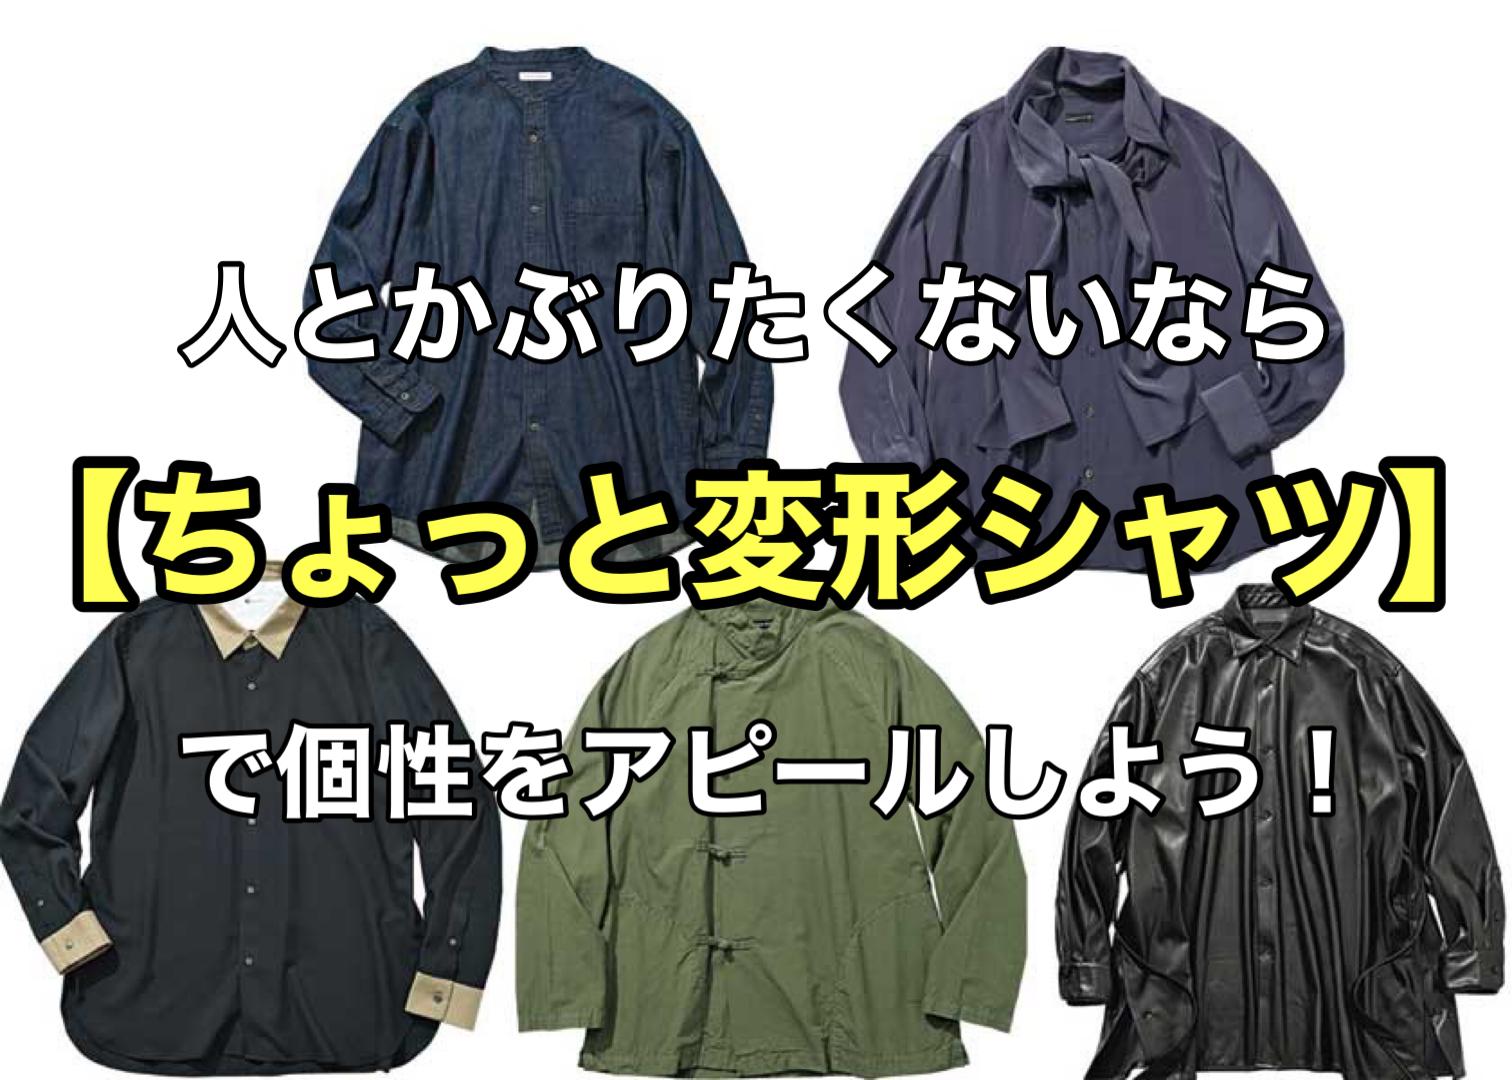 https://cdn.fineboys-online.jp/thegear/content/theme/img/org/article/3698/main.jpg?t=1634113202